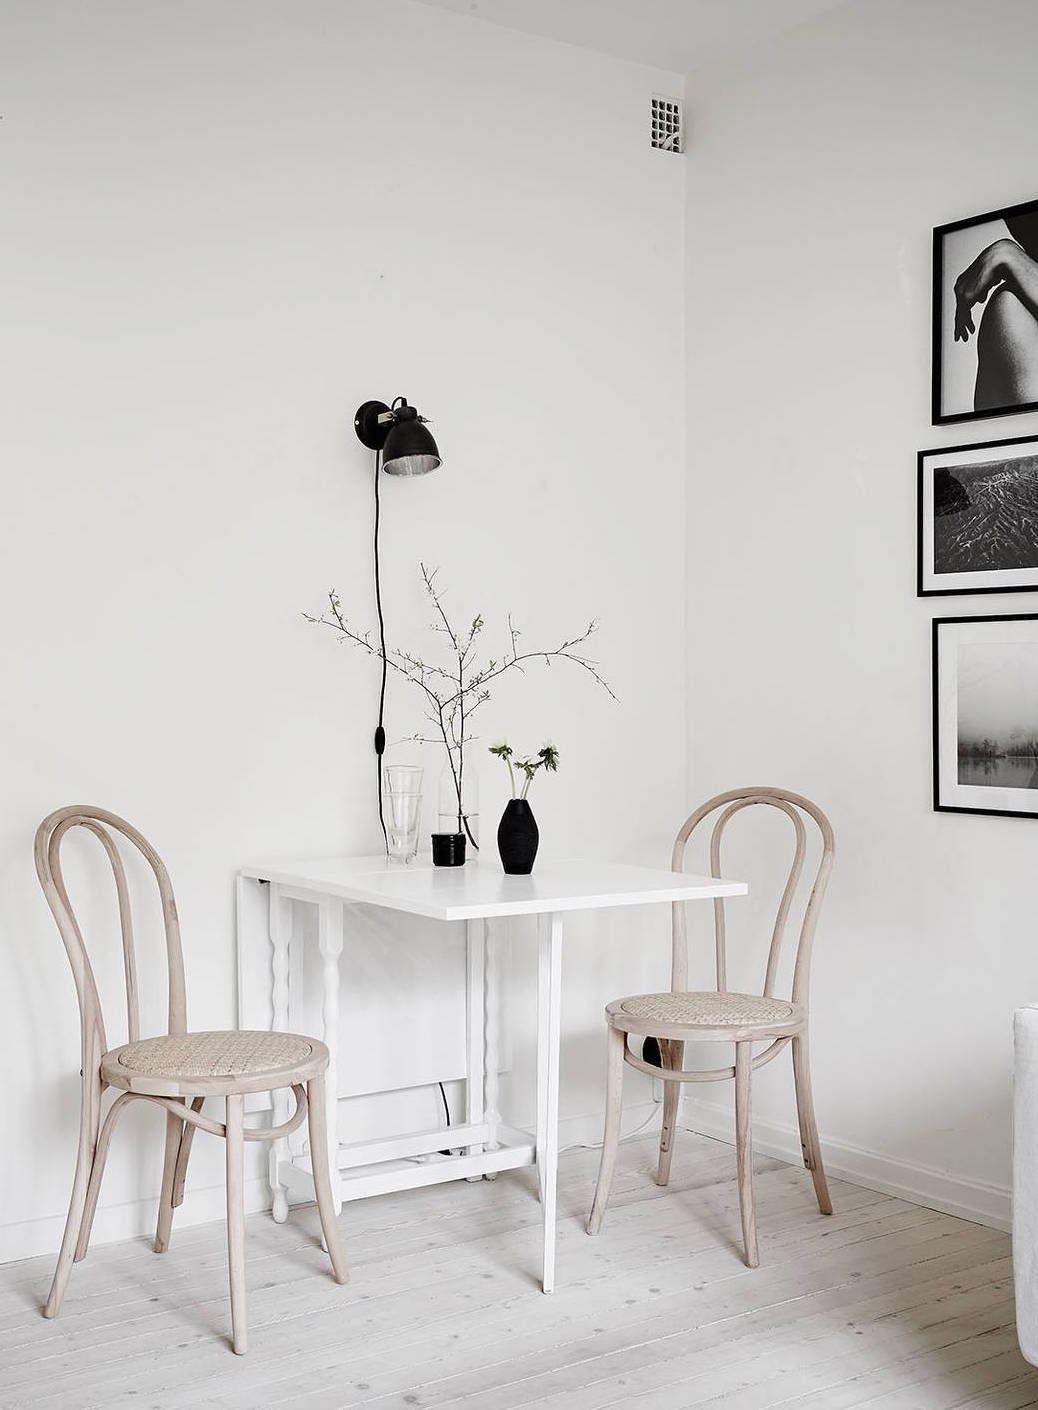 Dinner for two living room dining room design small - Small living room and dining room ...